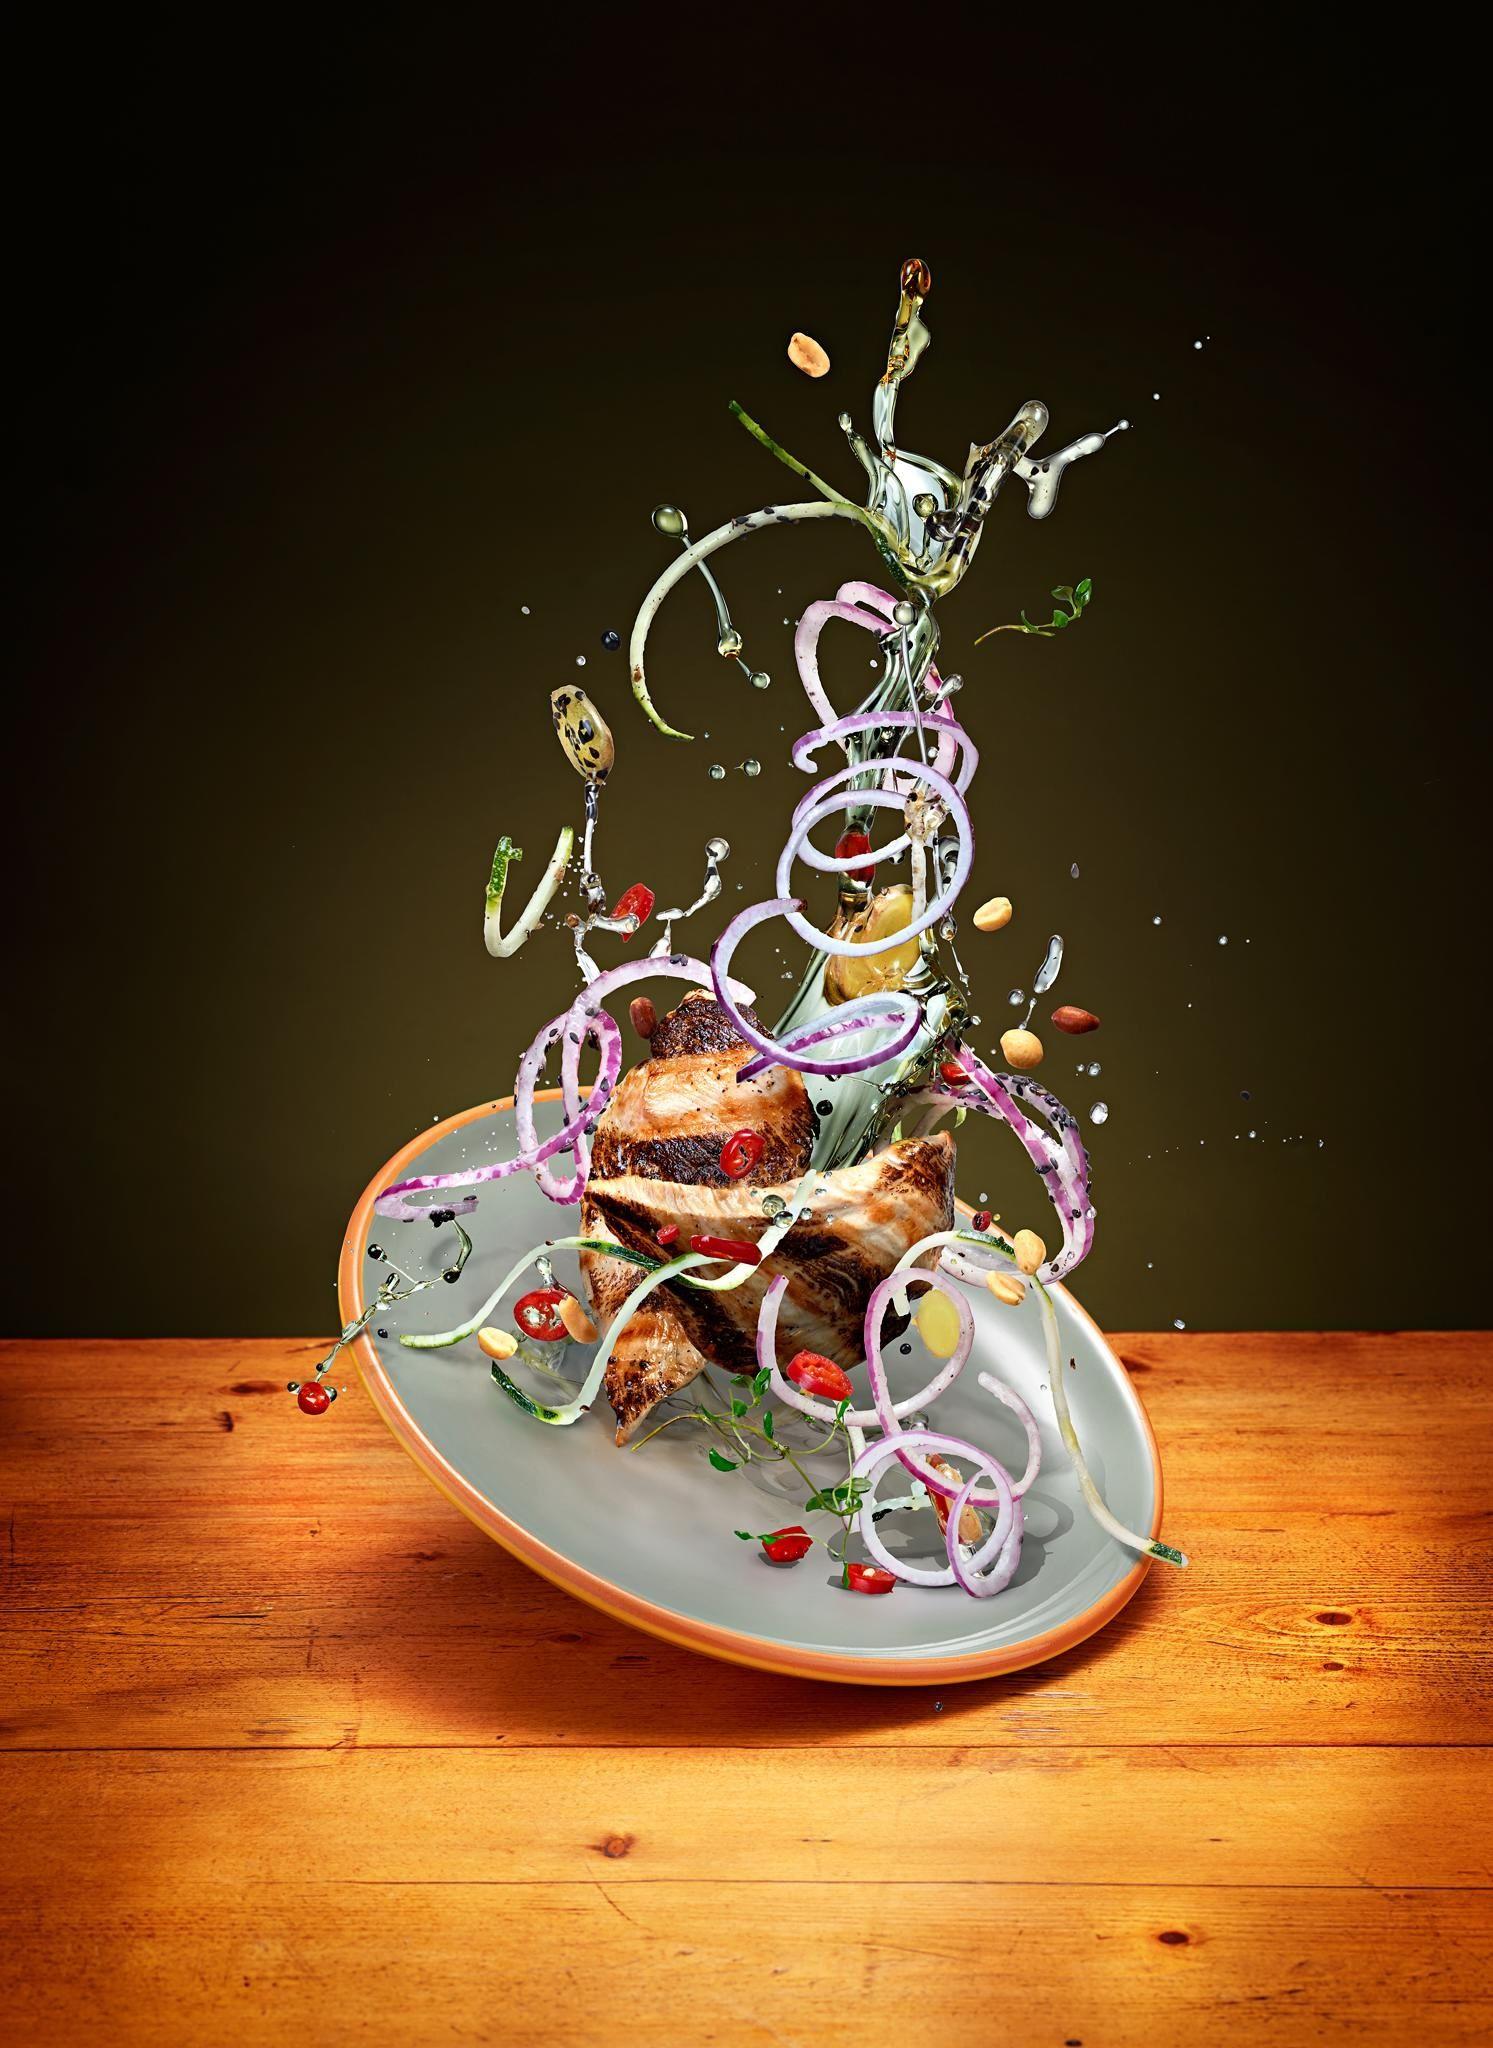 Art Buying & Artist Management   food and drink   Fotografie ideen ...